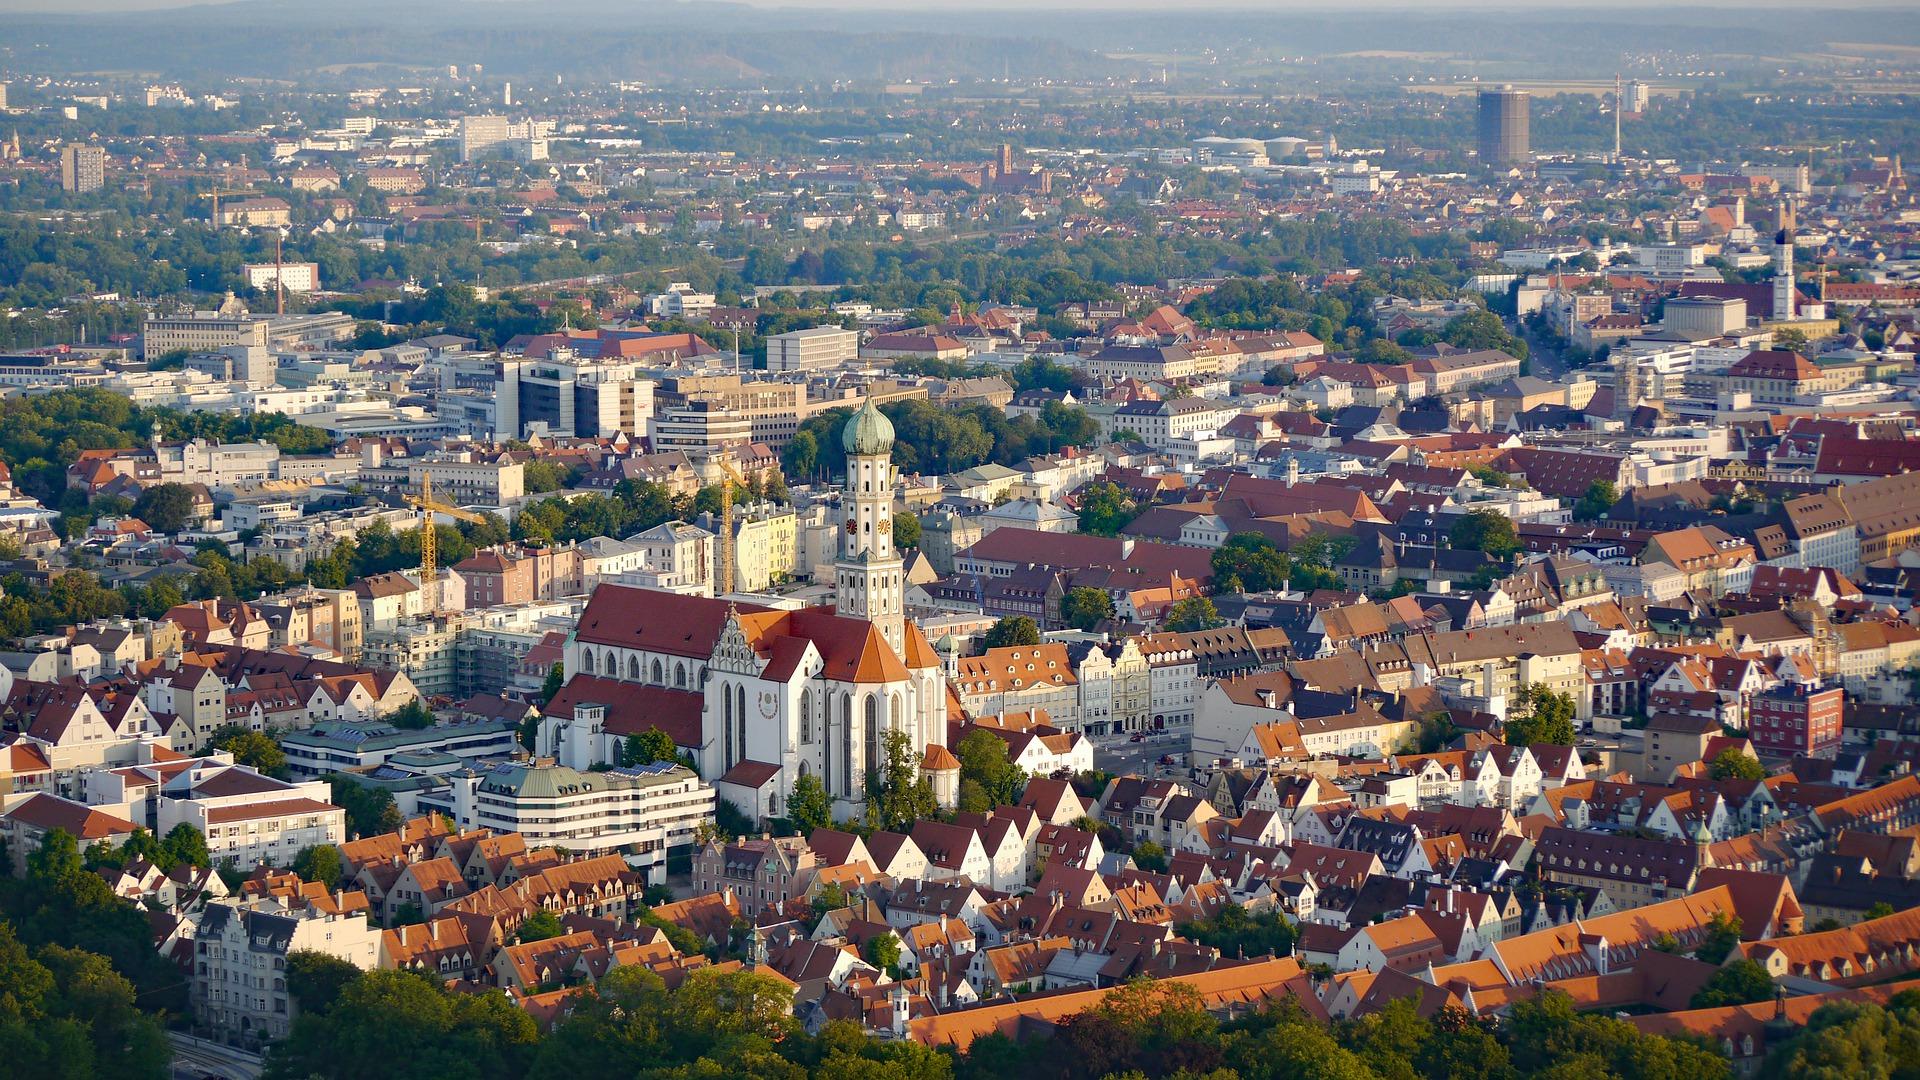 Luftbild Augsburg